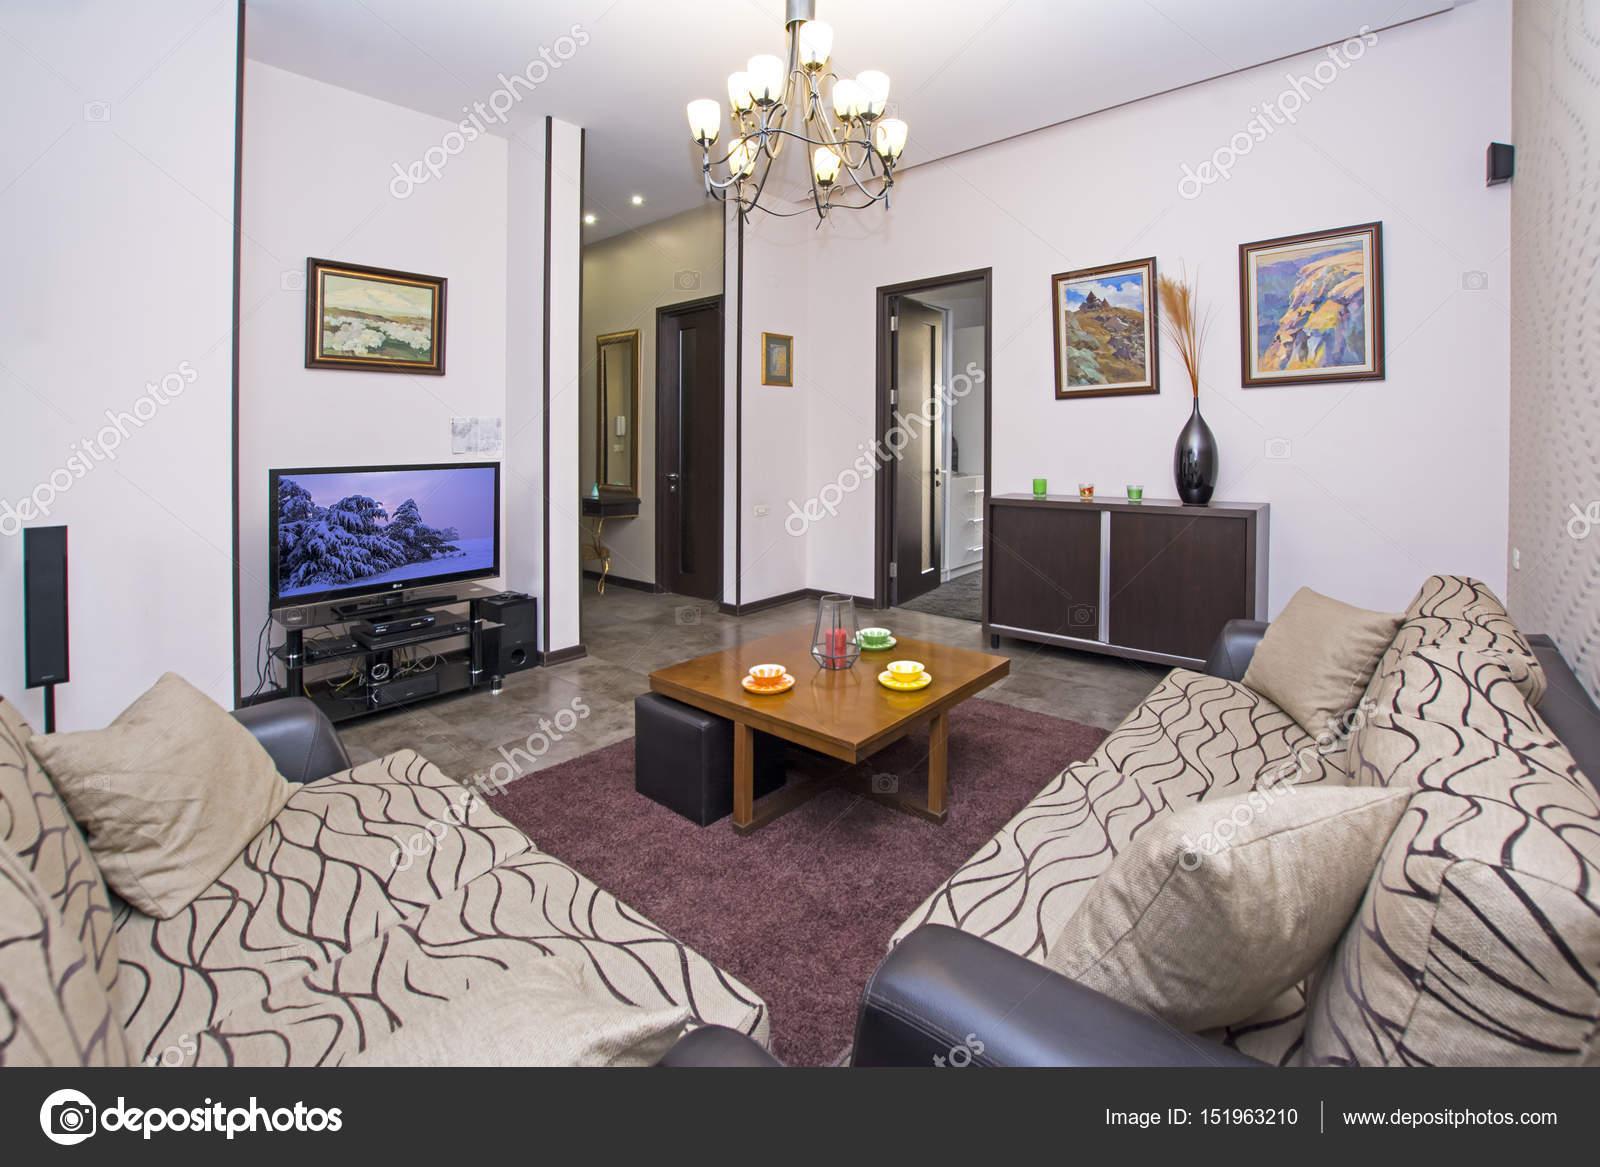 Yerevan Armenia April 11 2017 A Modern Apartment Living Room Luxury Apartment With Stylish Modern Interior Design Stock Editorial Photo C Artavet 151963210